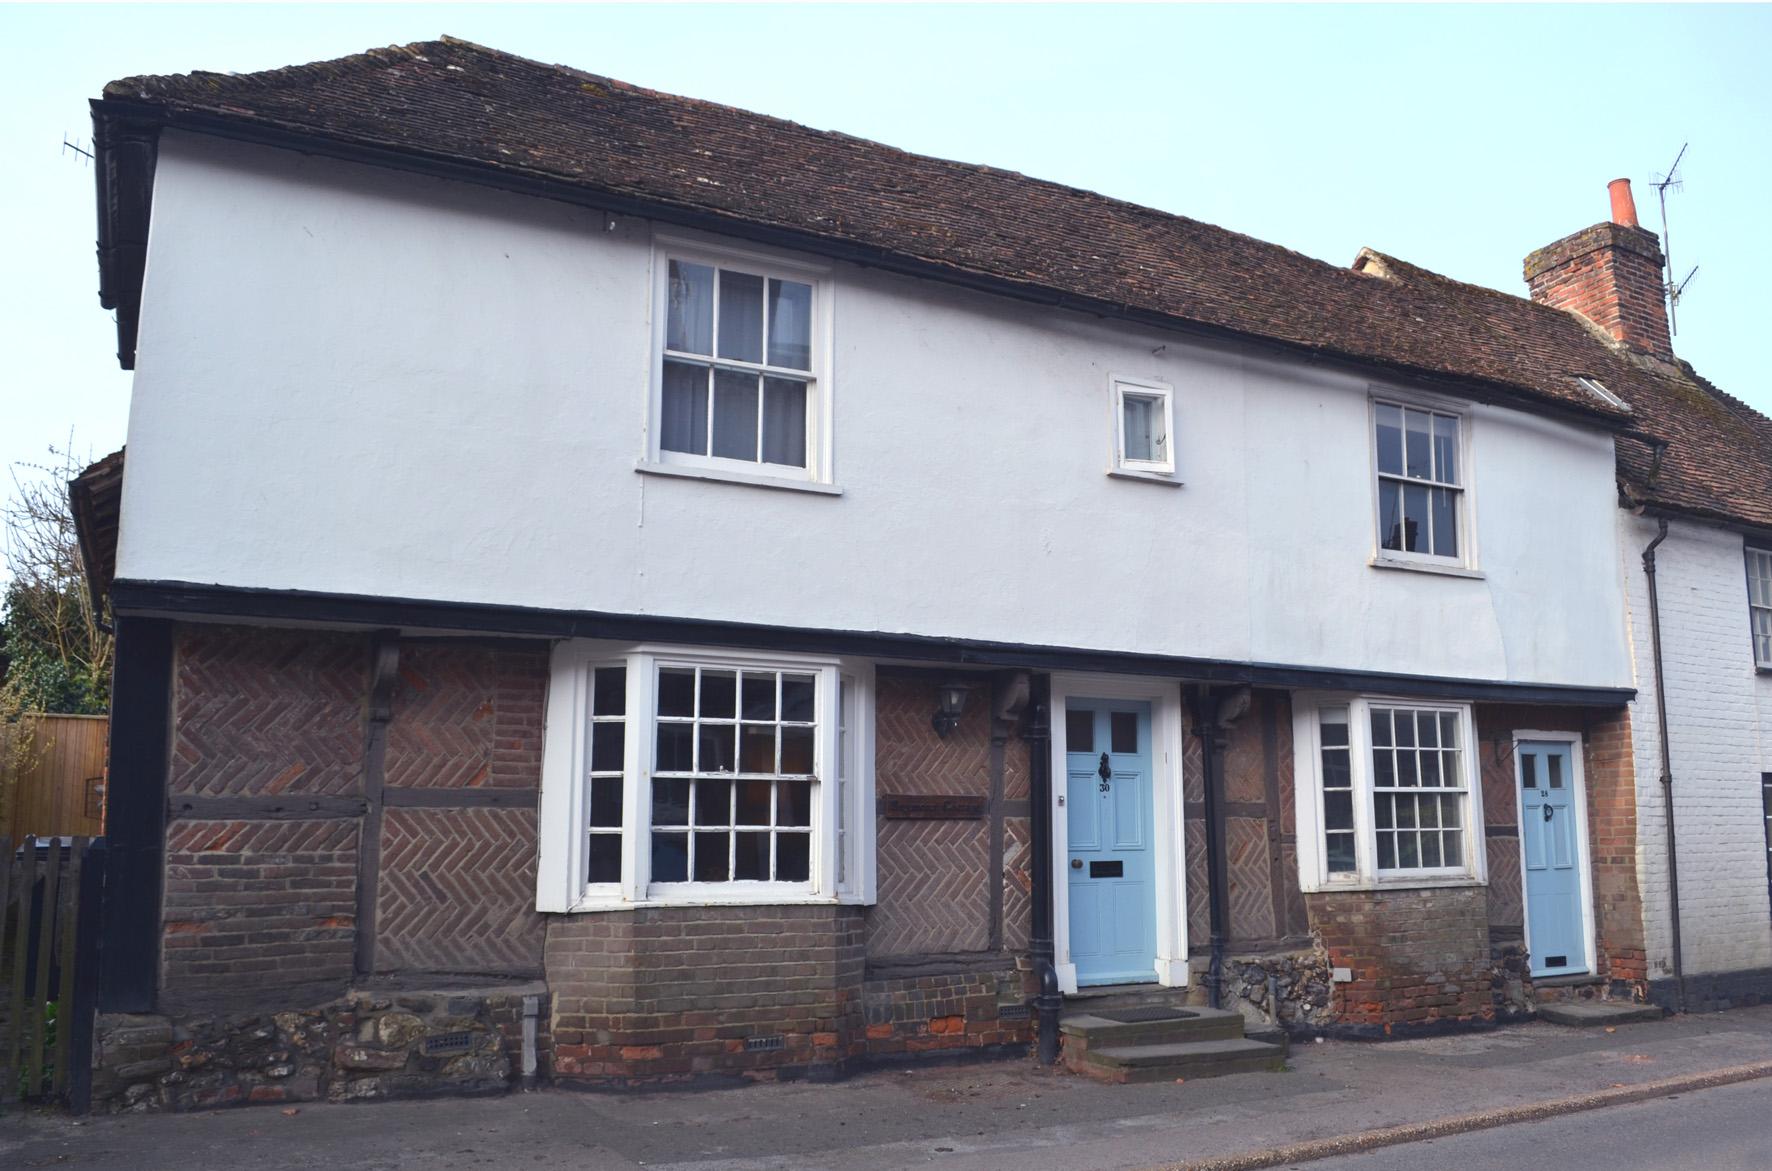 28-30 Scotton Street, Wye, Kent